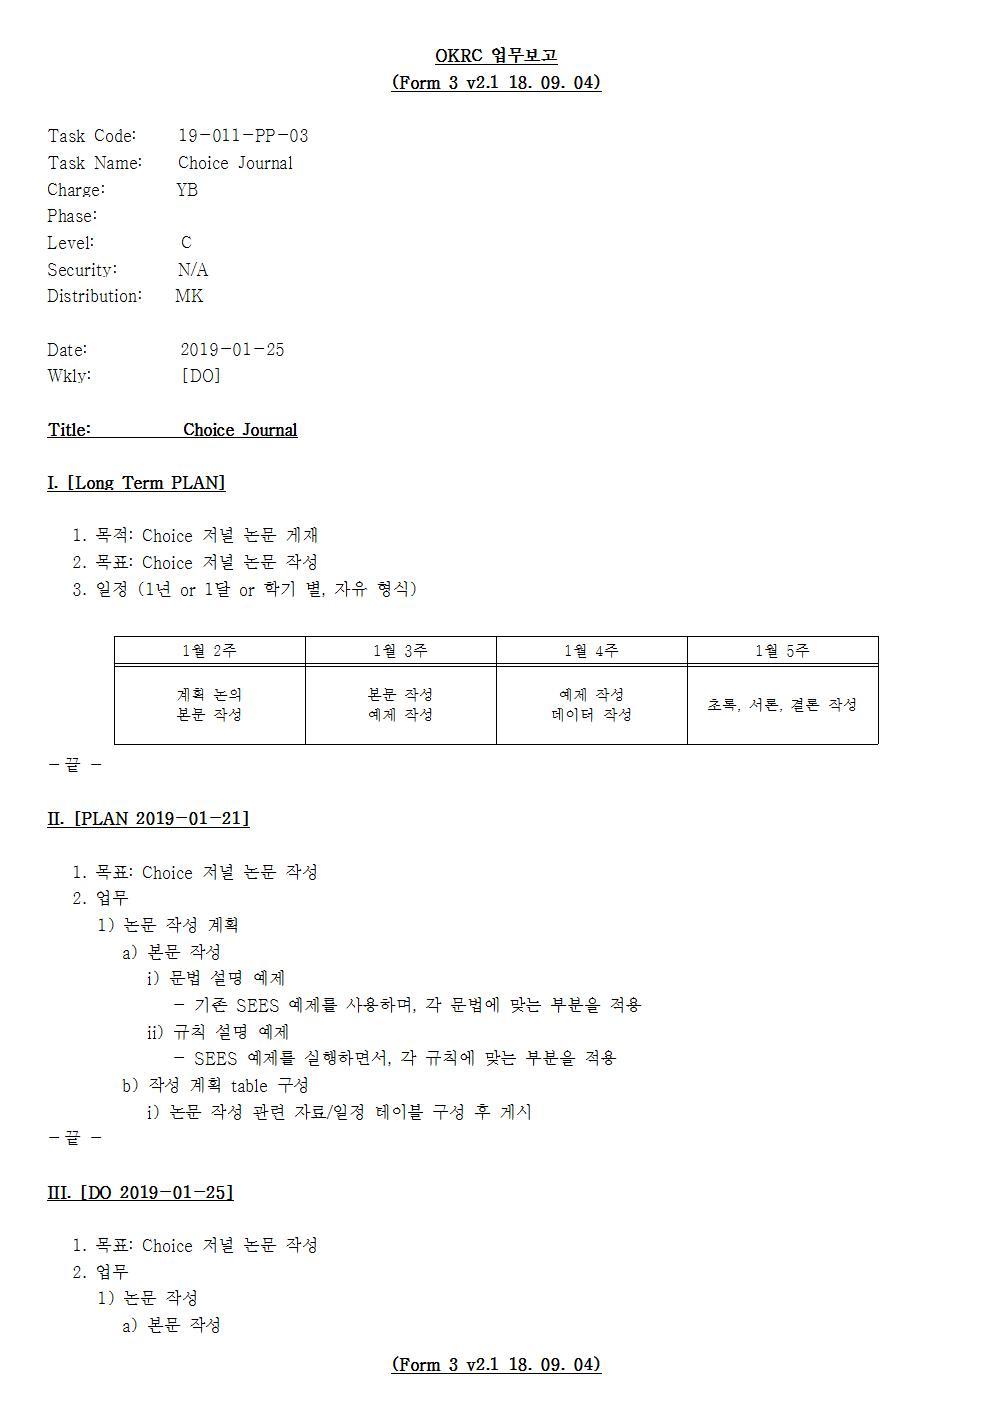 D-[19-011-PP-03]-[Choice Journal]-[2019-01-25][YB]001.jpg